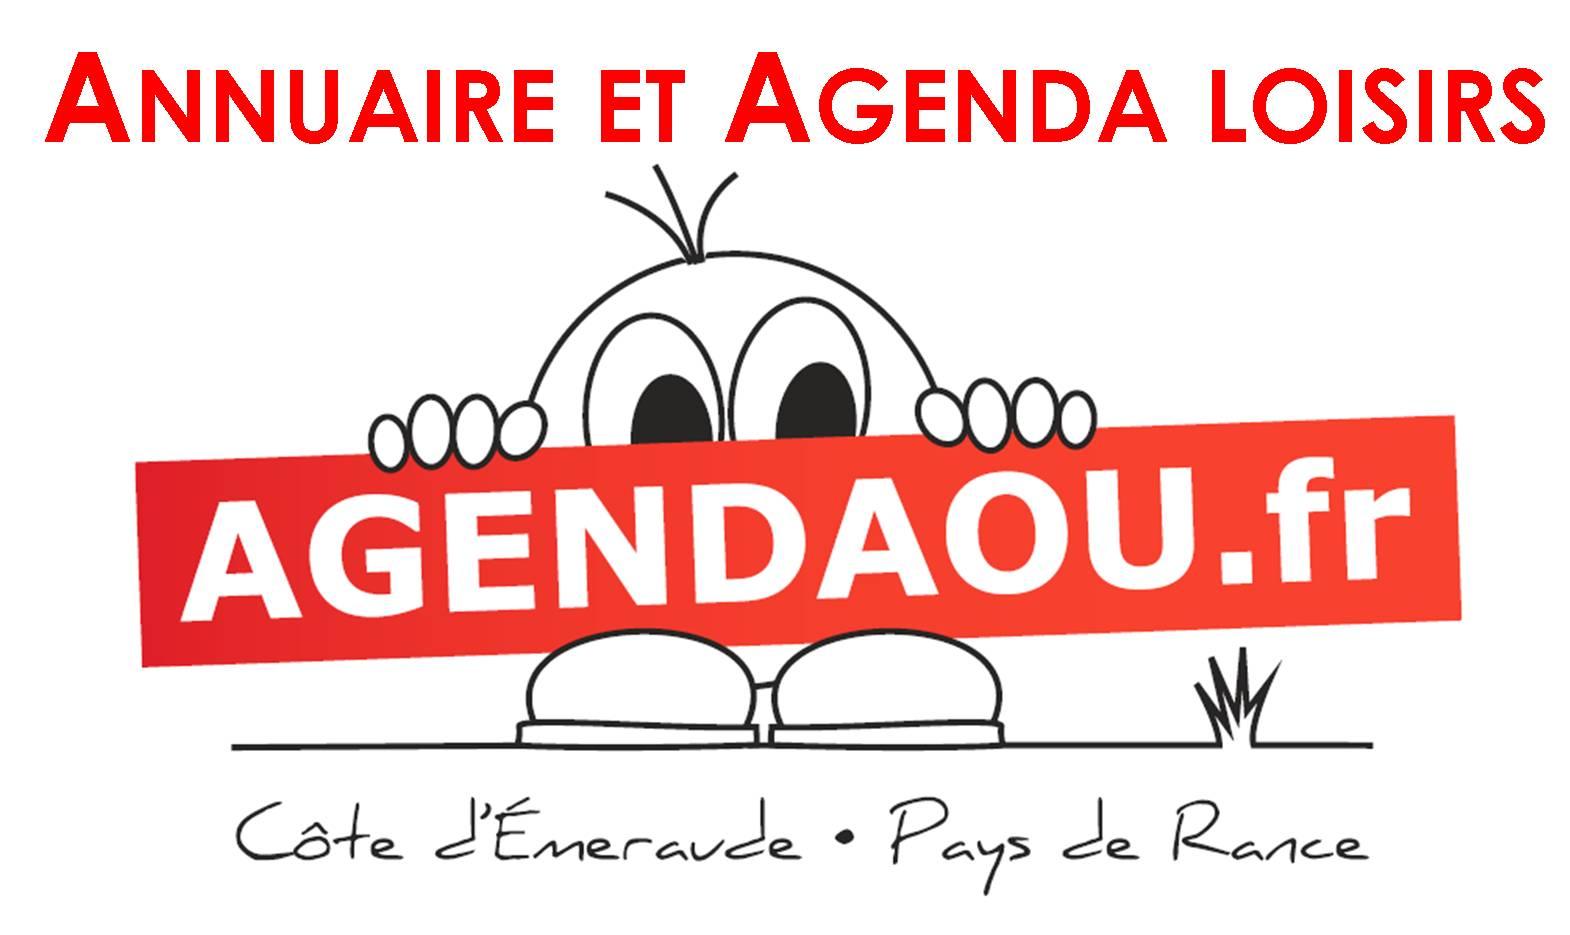 AGENDAOU.fr annuaire et agenda